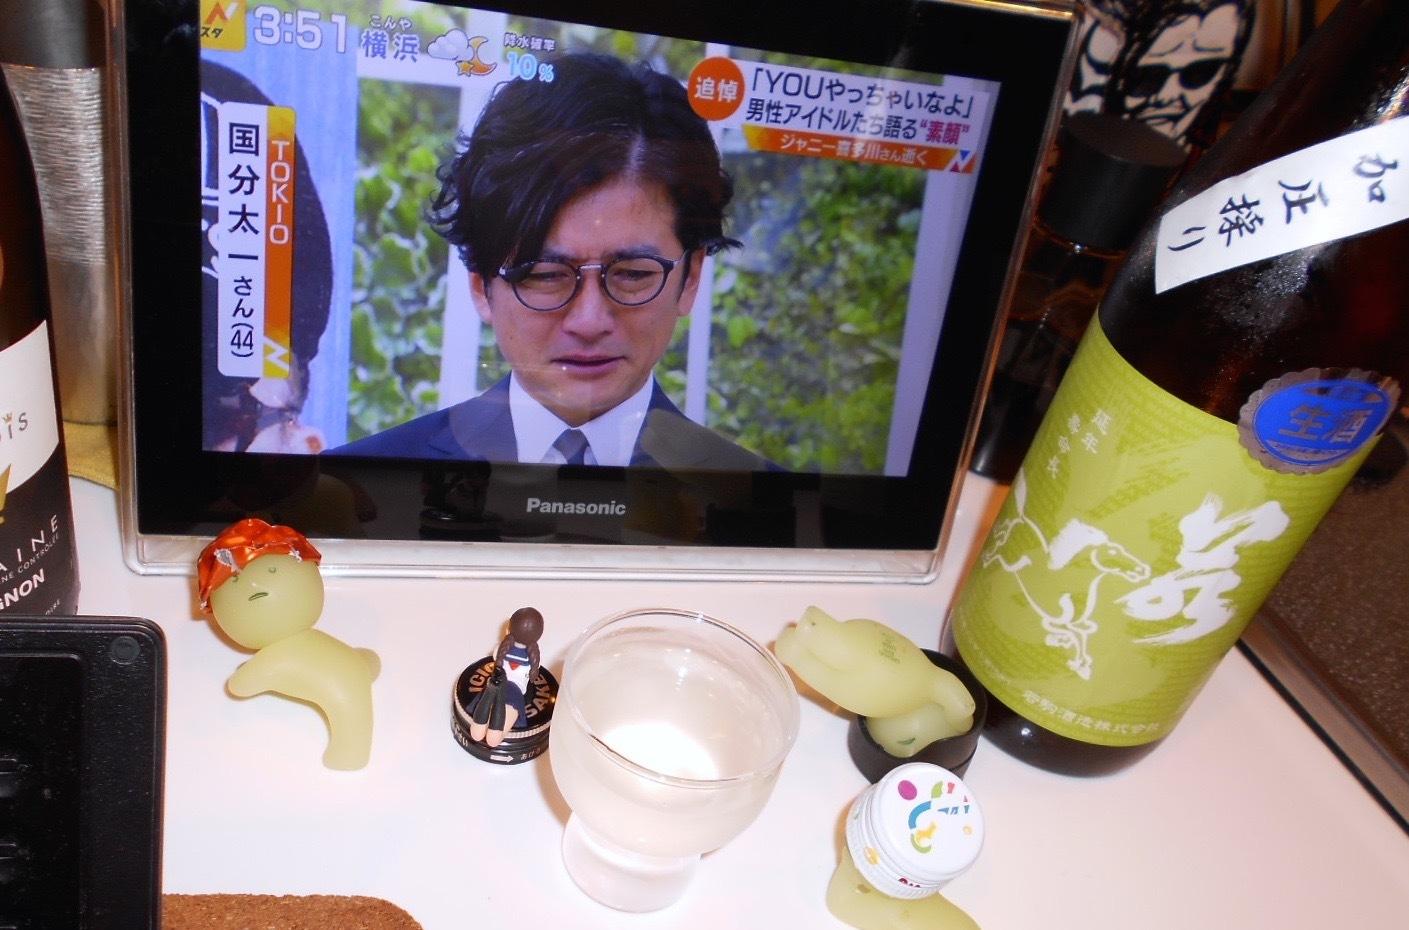 wakakoma_hattannishiki80_30b7.jpg